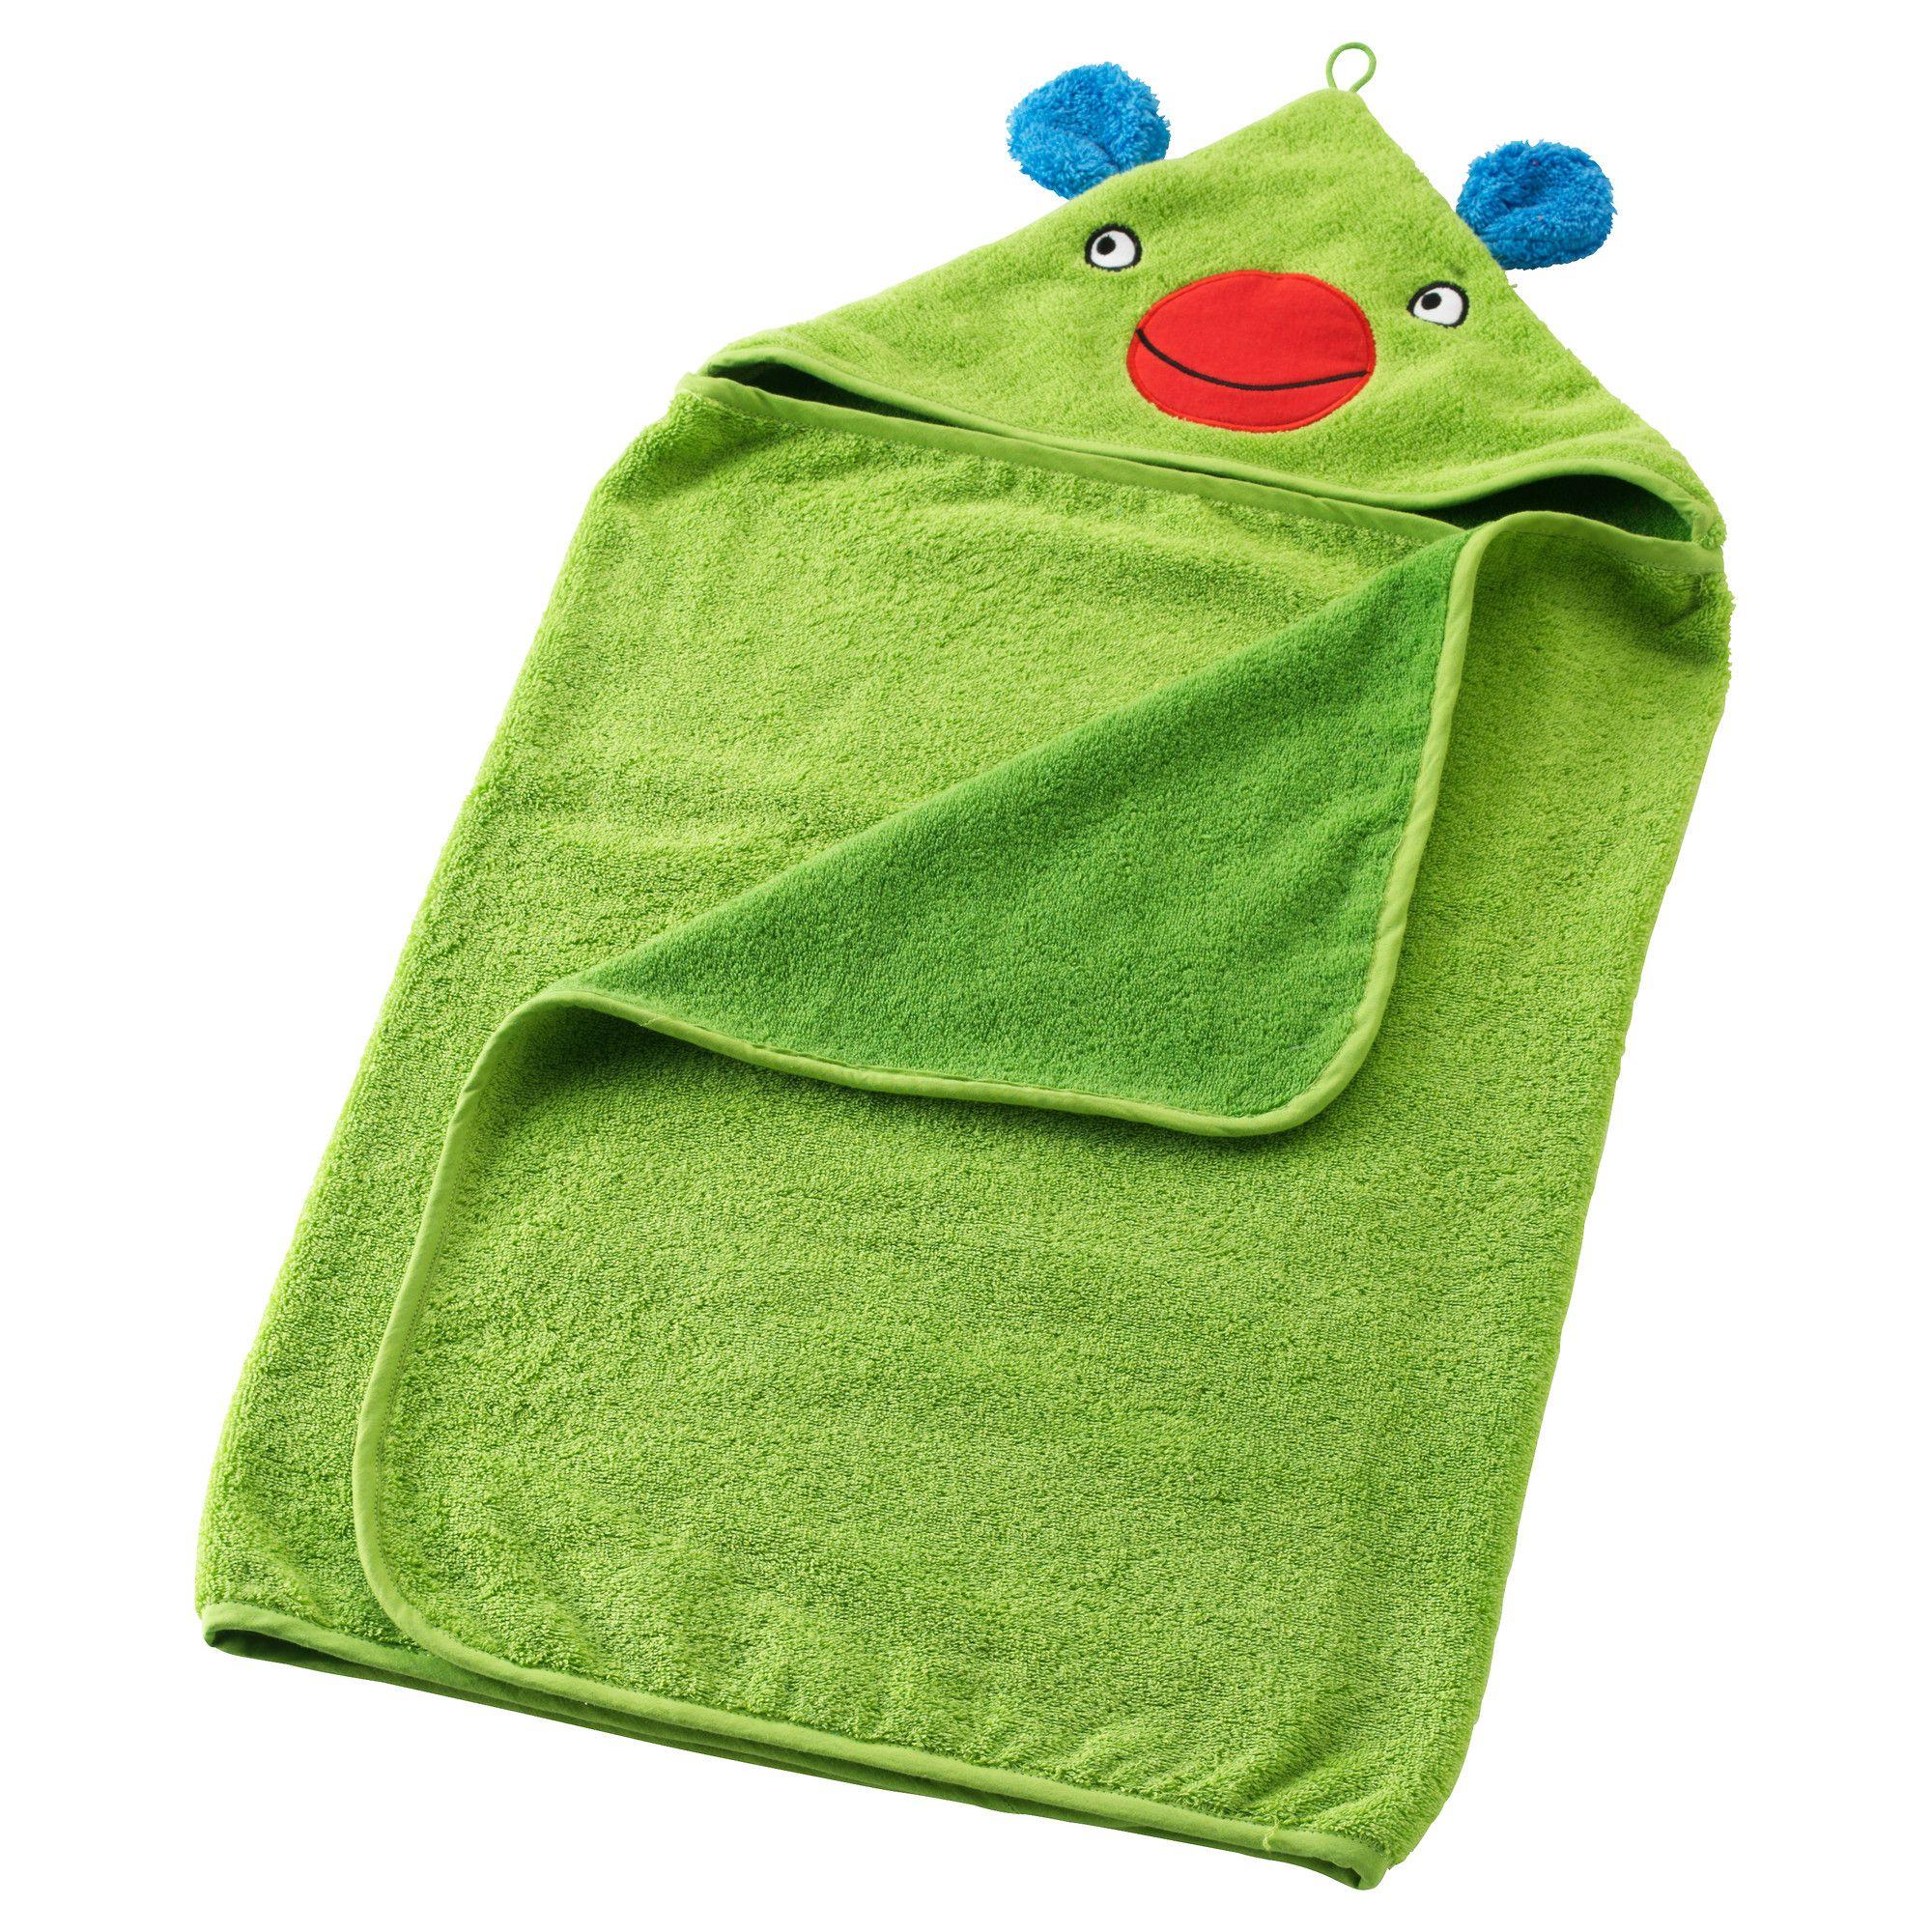 Ikea Us Furniture And Home Furnishings Ikea Baby Baby Towel